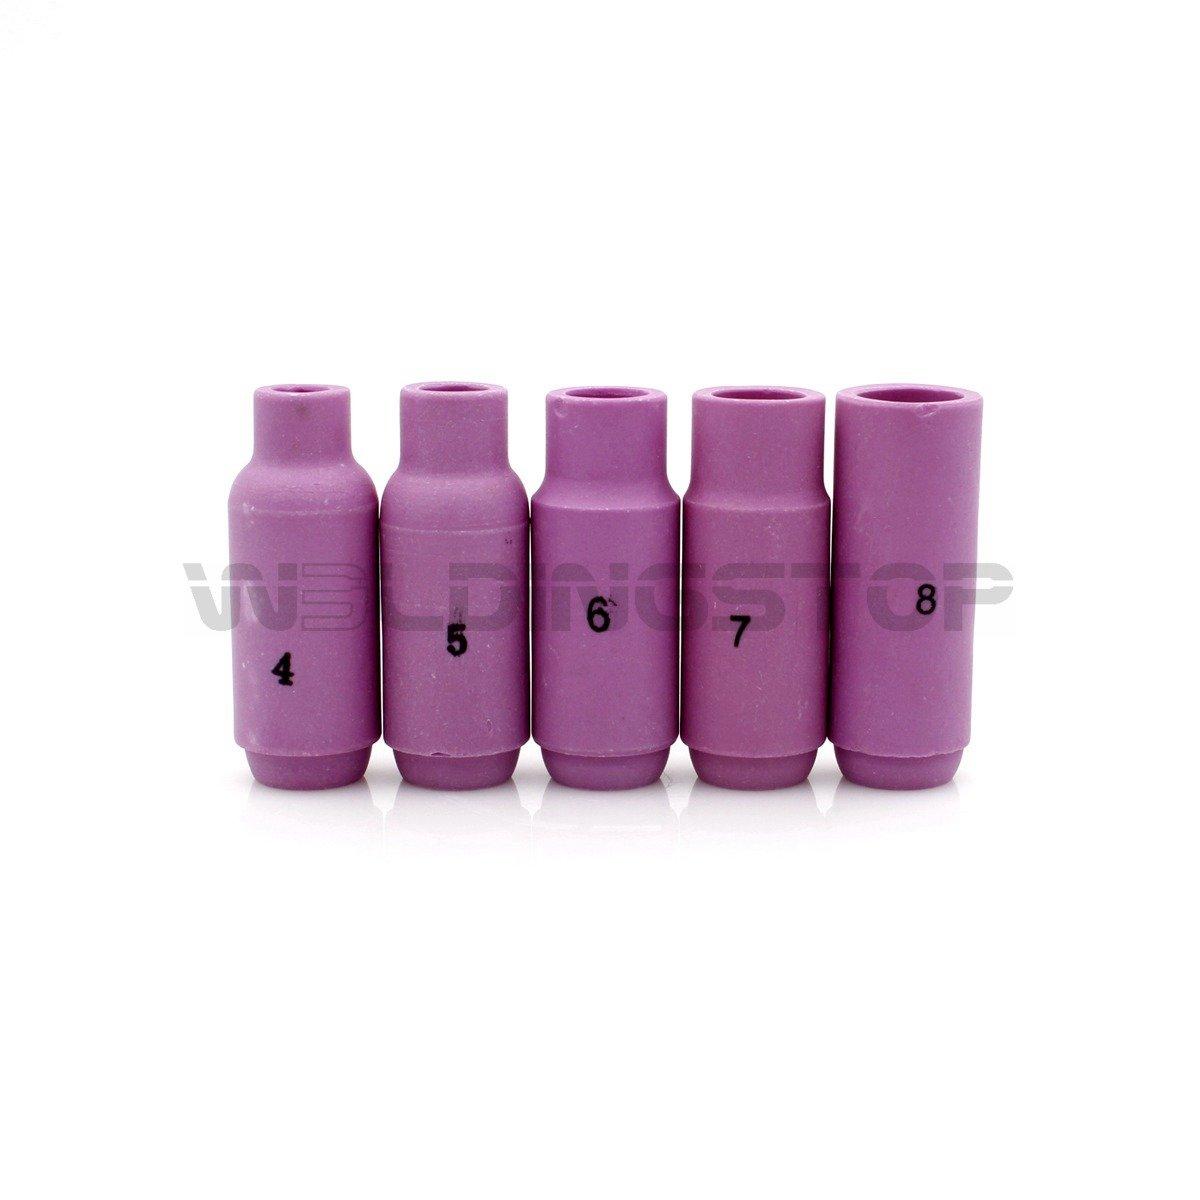 "5//16/"" FITS 17//18//26 TIG TORCHES PACK OF 10 10N49 #5 Alumina Ceramic Nozzles"